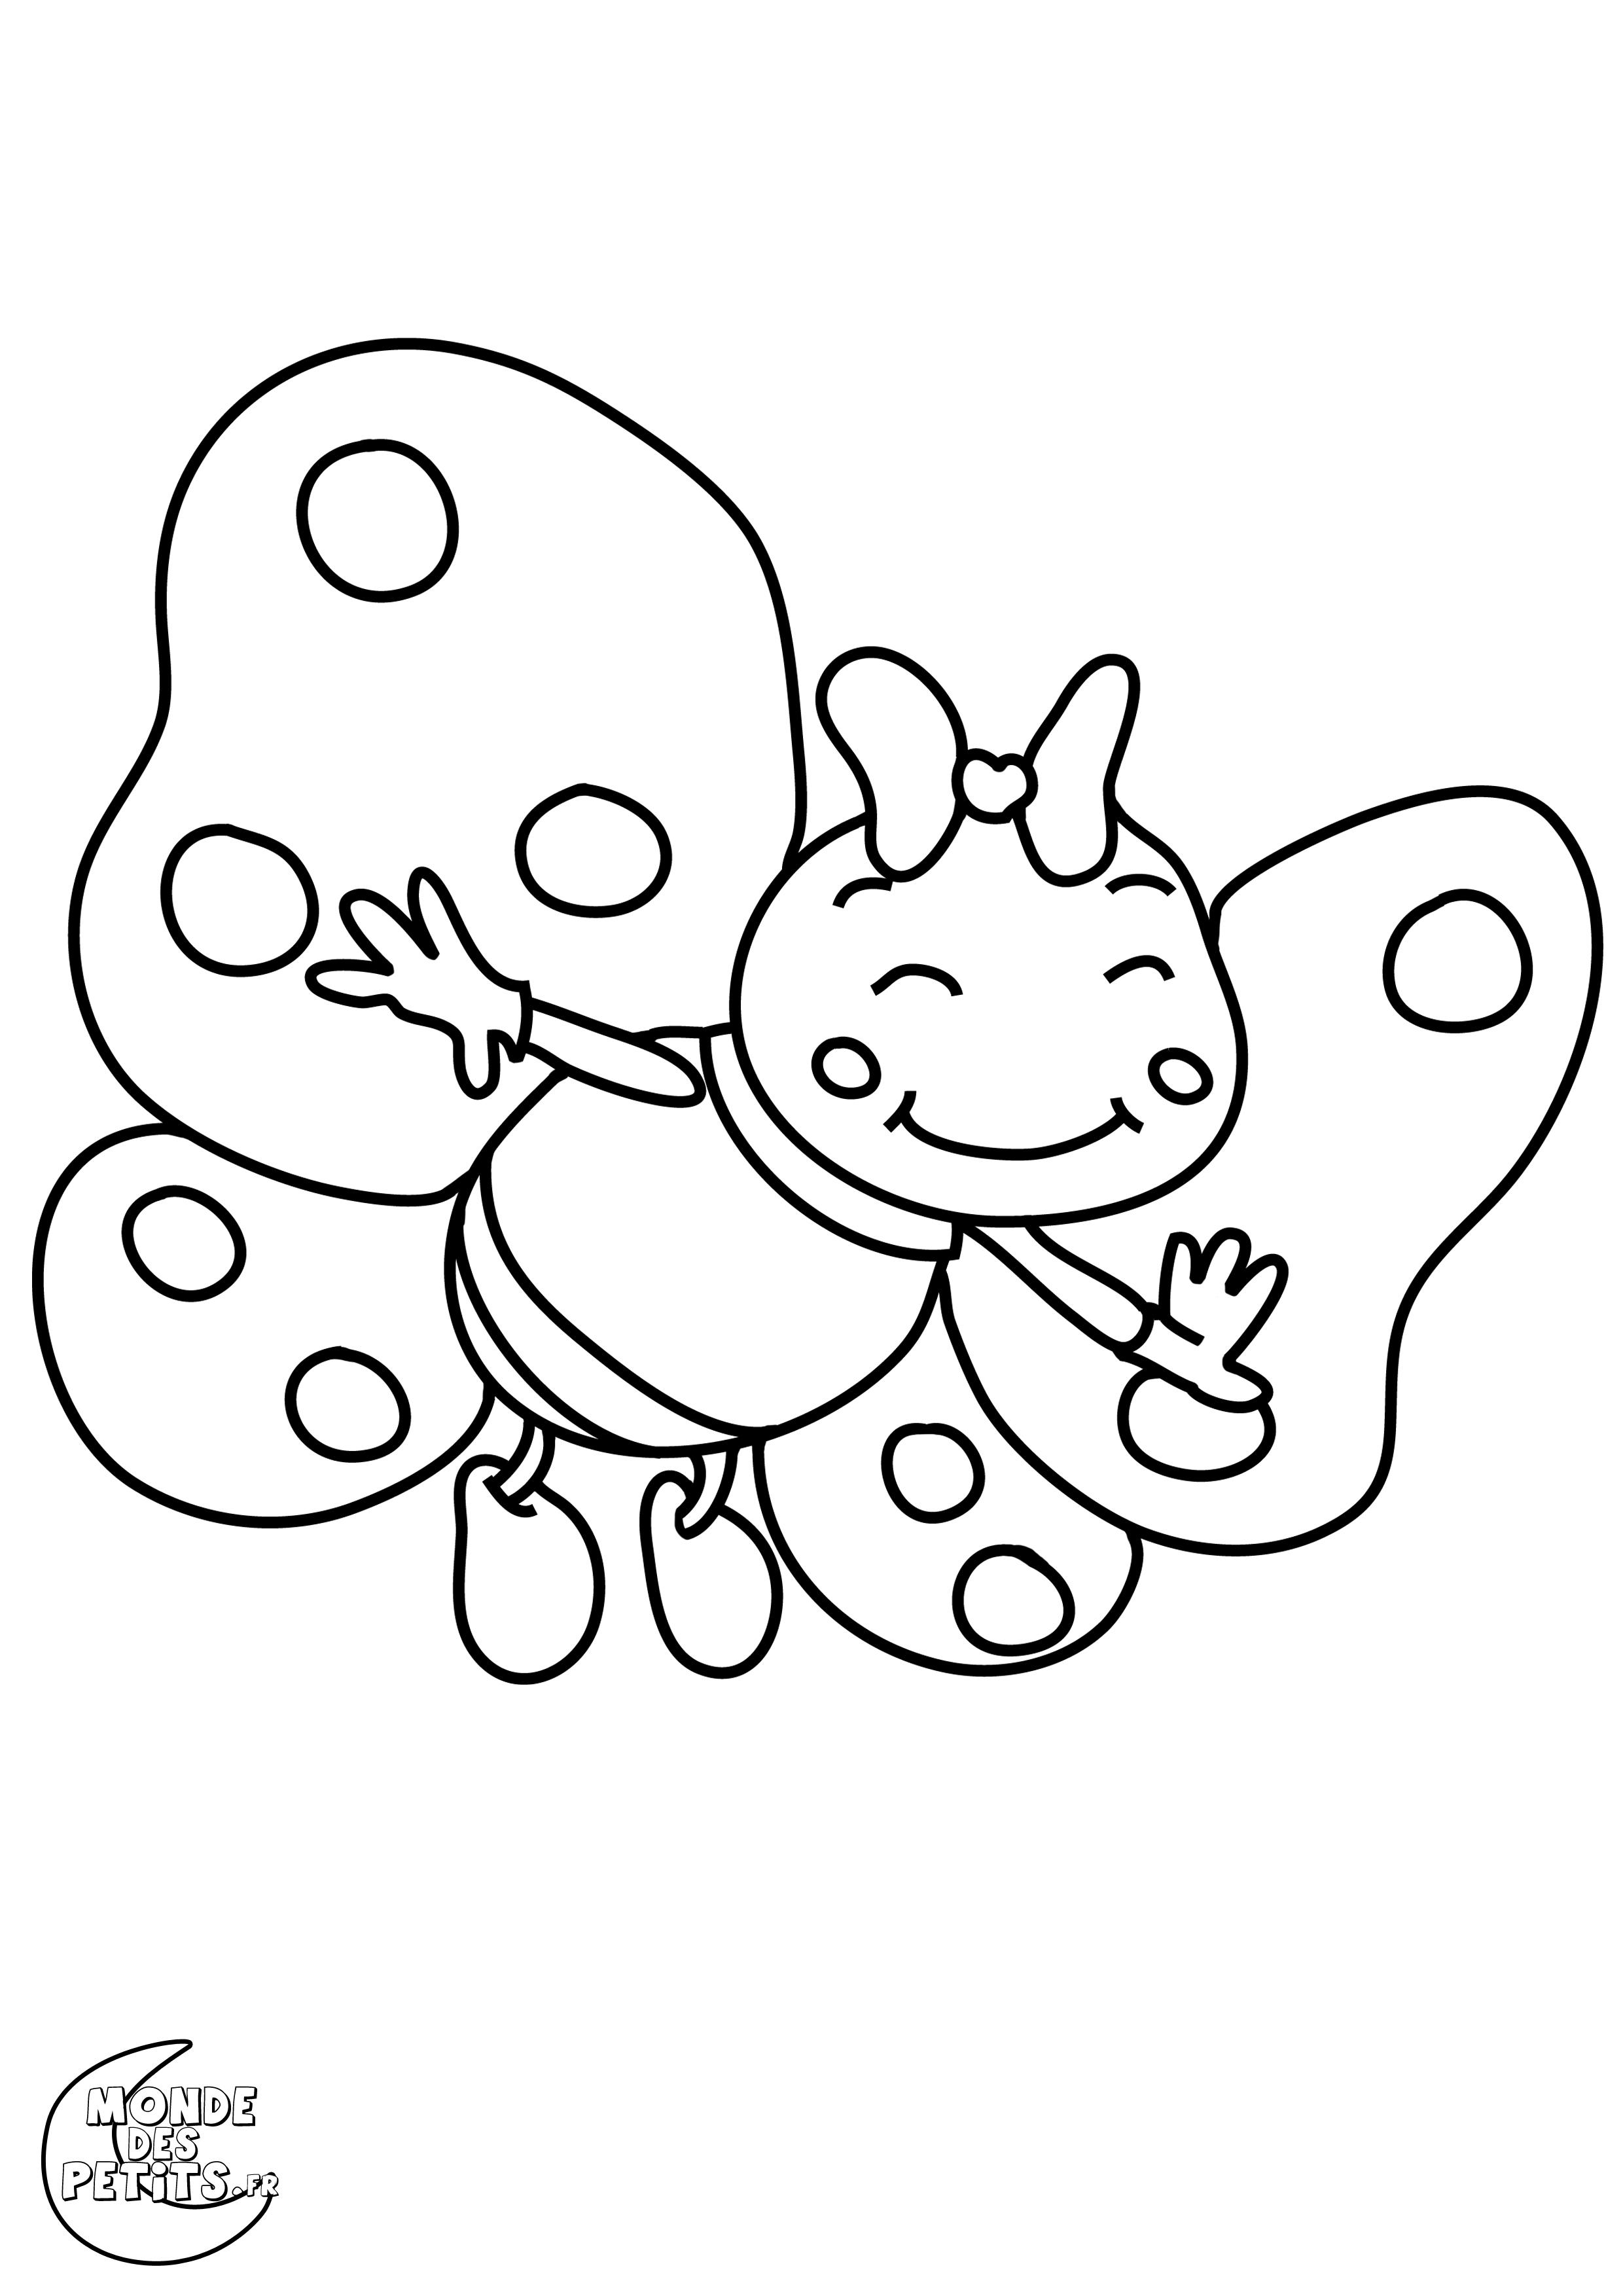 Coloriage Prenom Hugo L Escargot | Imprimer Et Obtenir Une encequiconcerne Hugo L'Escargot